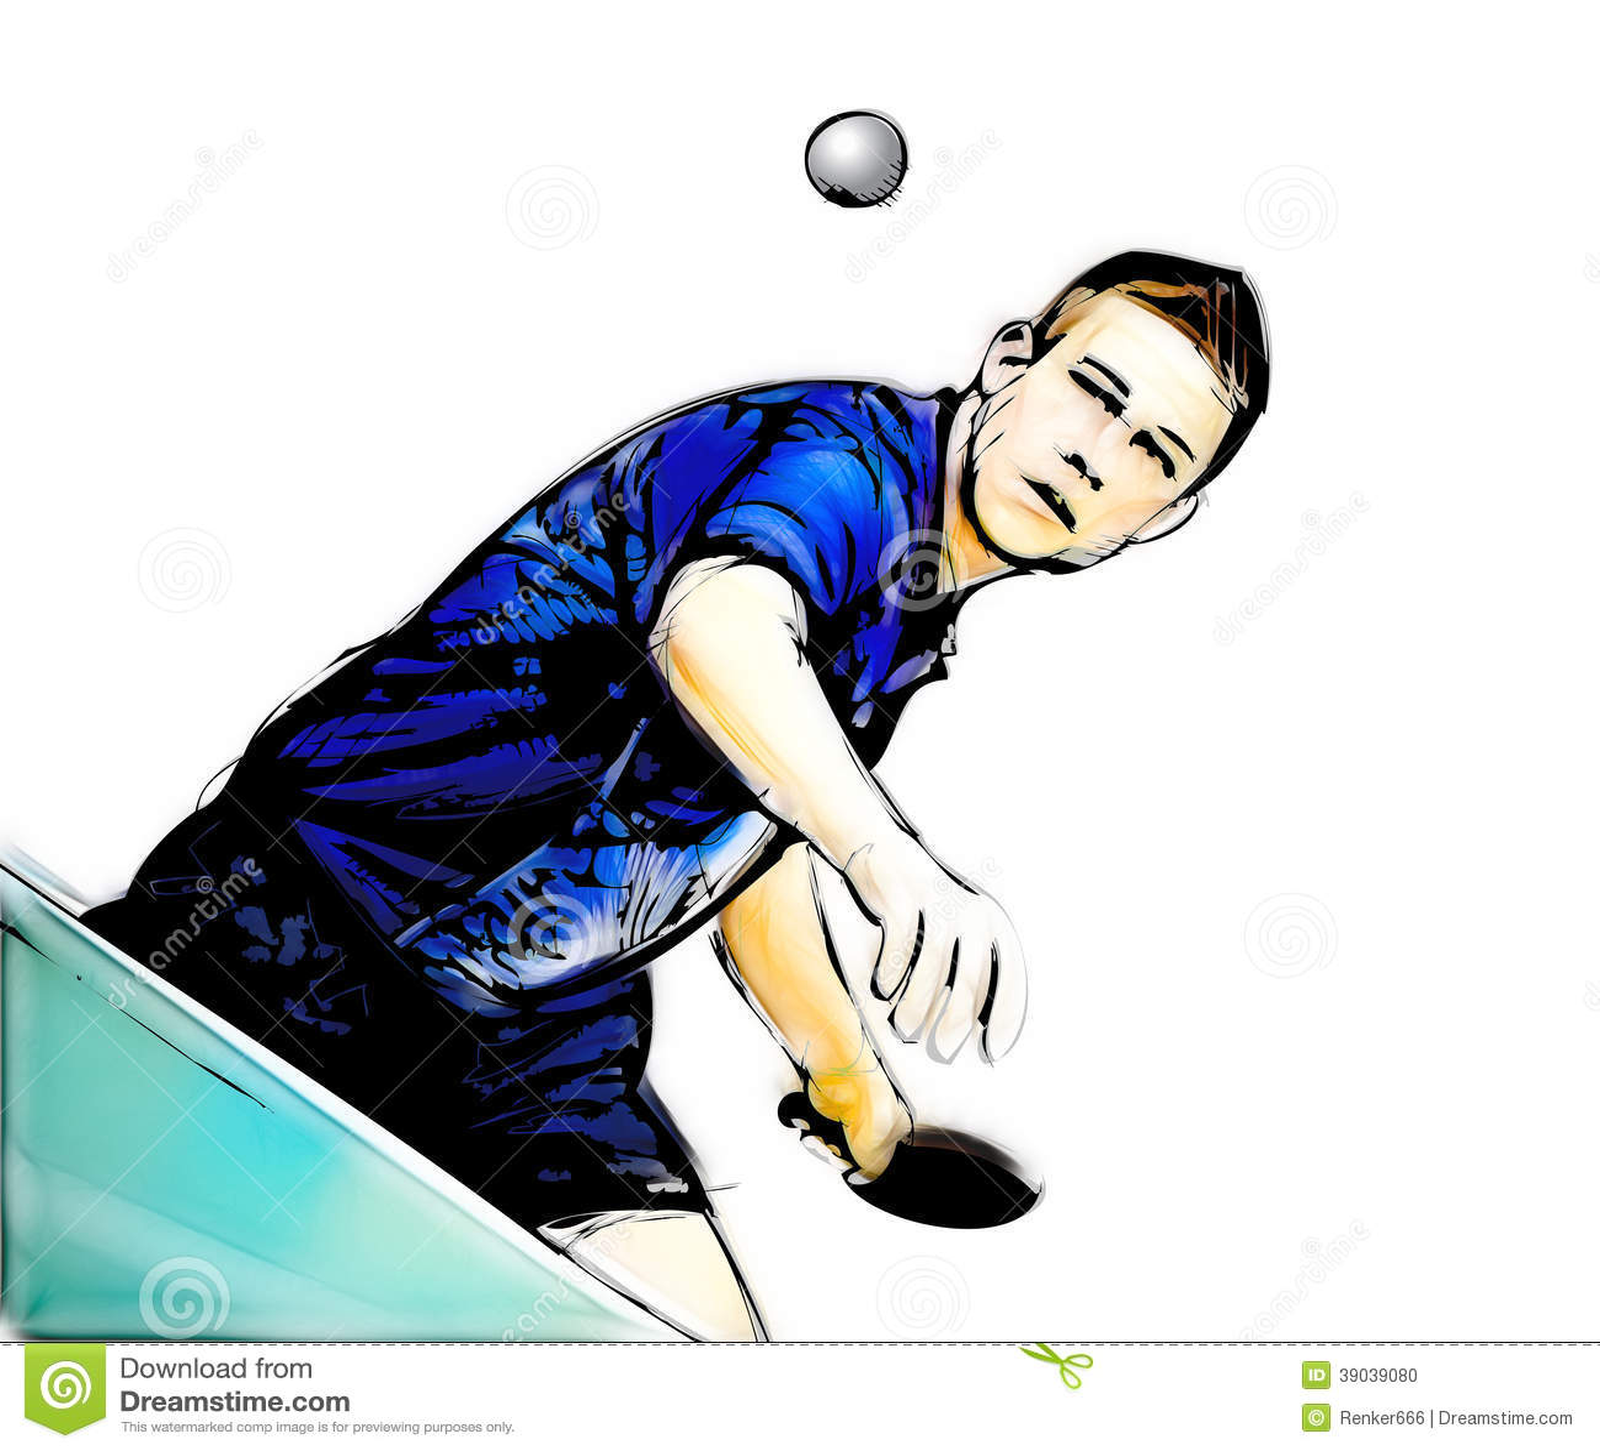 Ping Pong Player Illustration Stock Illustration Image